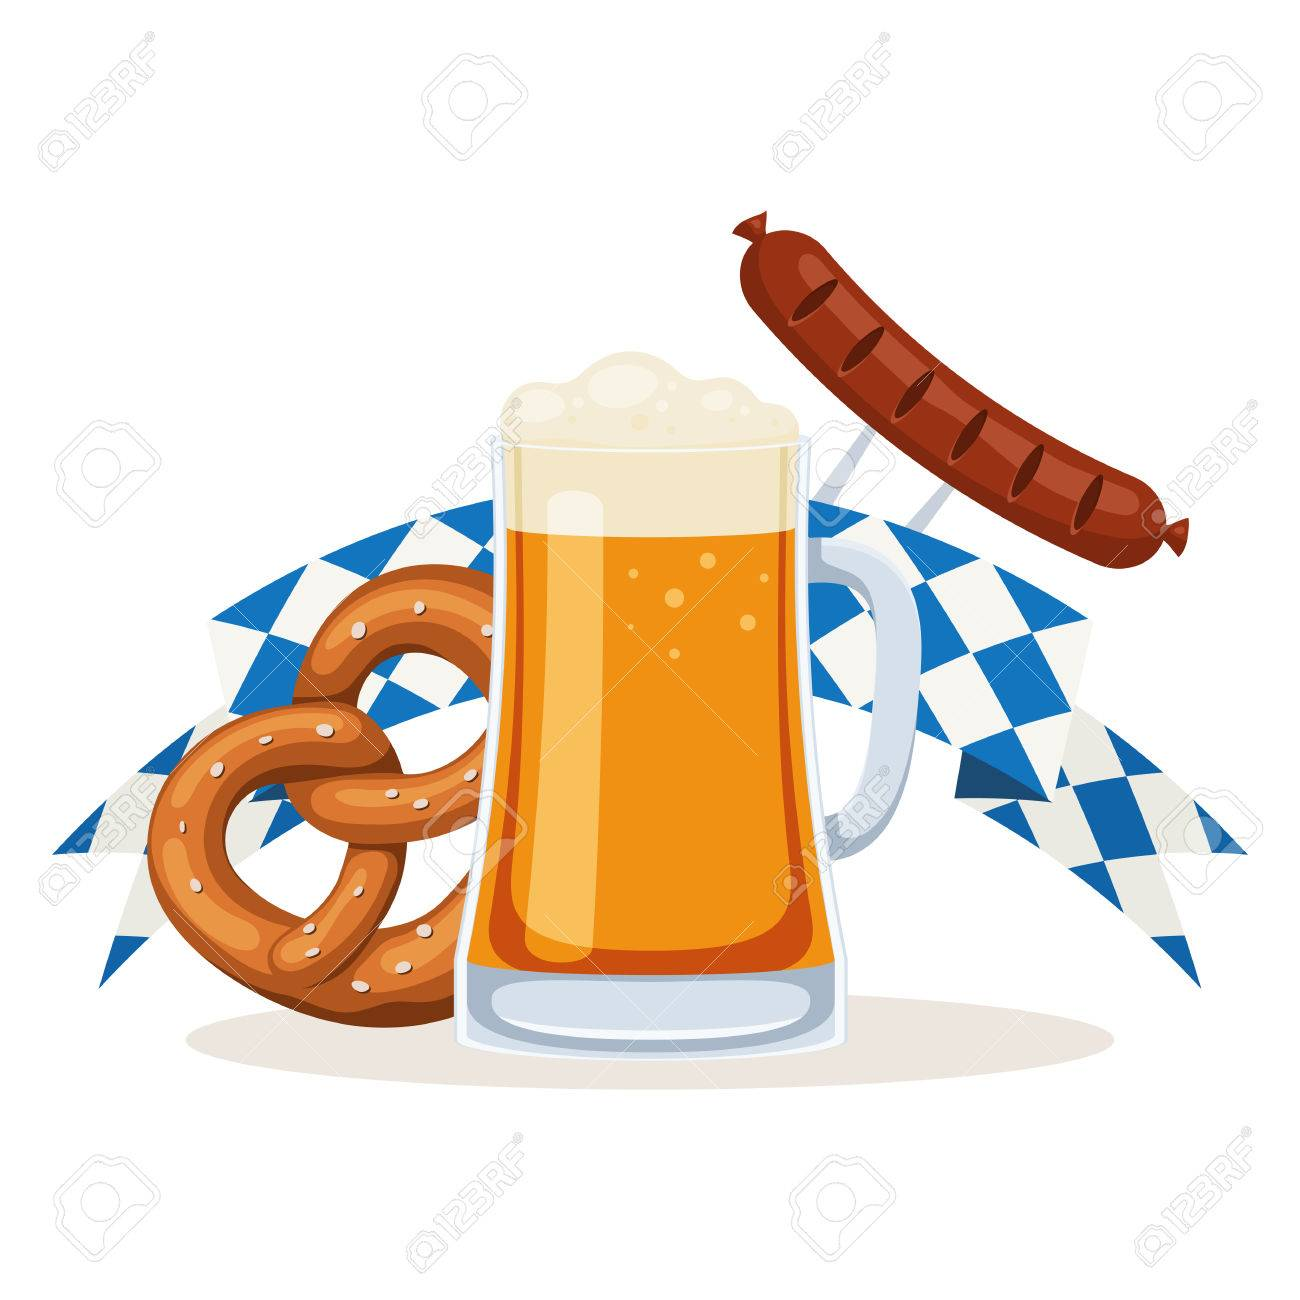 Oktoberfest Beer Festival Poster Beer Mug Bavarian Pretzel Royalty Free Cliparts Vectors And Stock Illustration Image 86414973